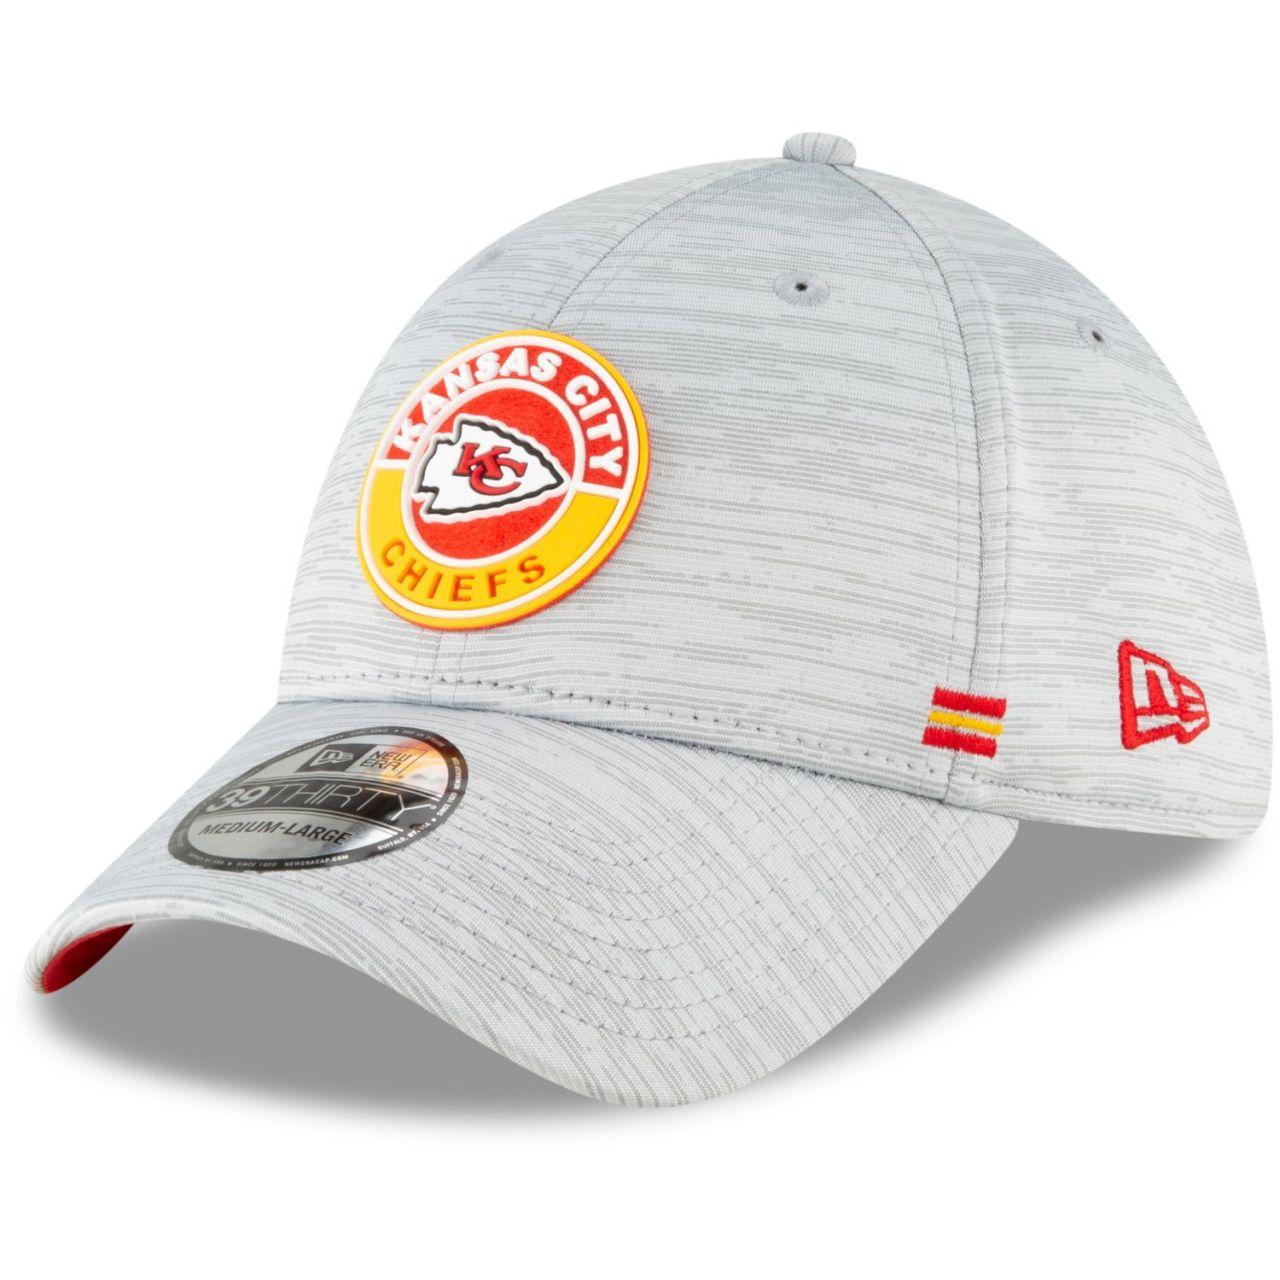 amfoo - New Era 39Thirty Cap - SIDELINE 2020 Kansas City Chiefs